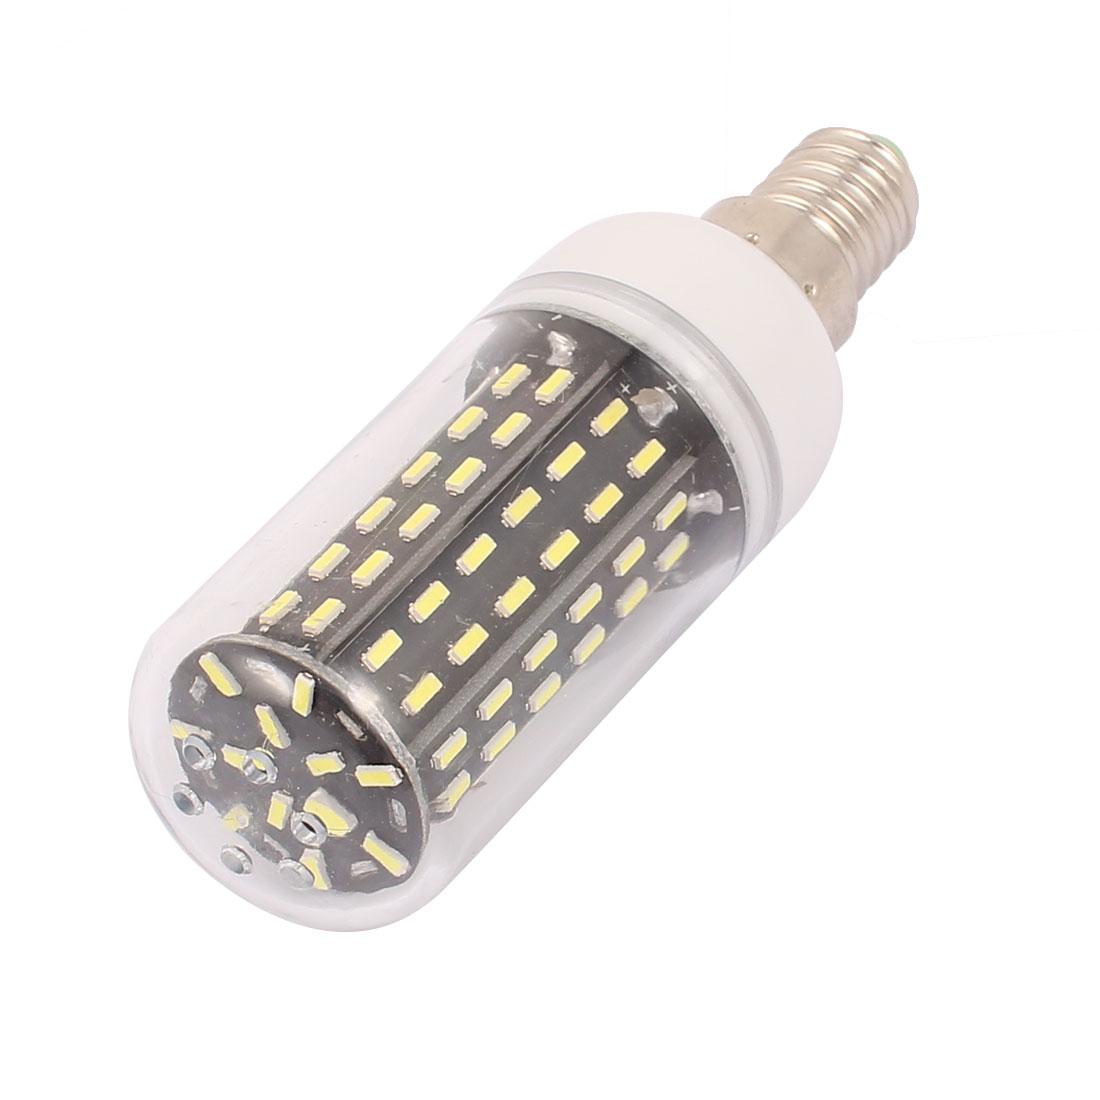 AC 220V New Super Bright E14 9W 96 LEDs 4014 SMD Energy Saving Corn Bulb Lamp Pure White